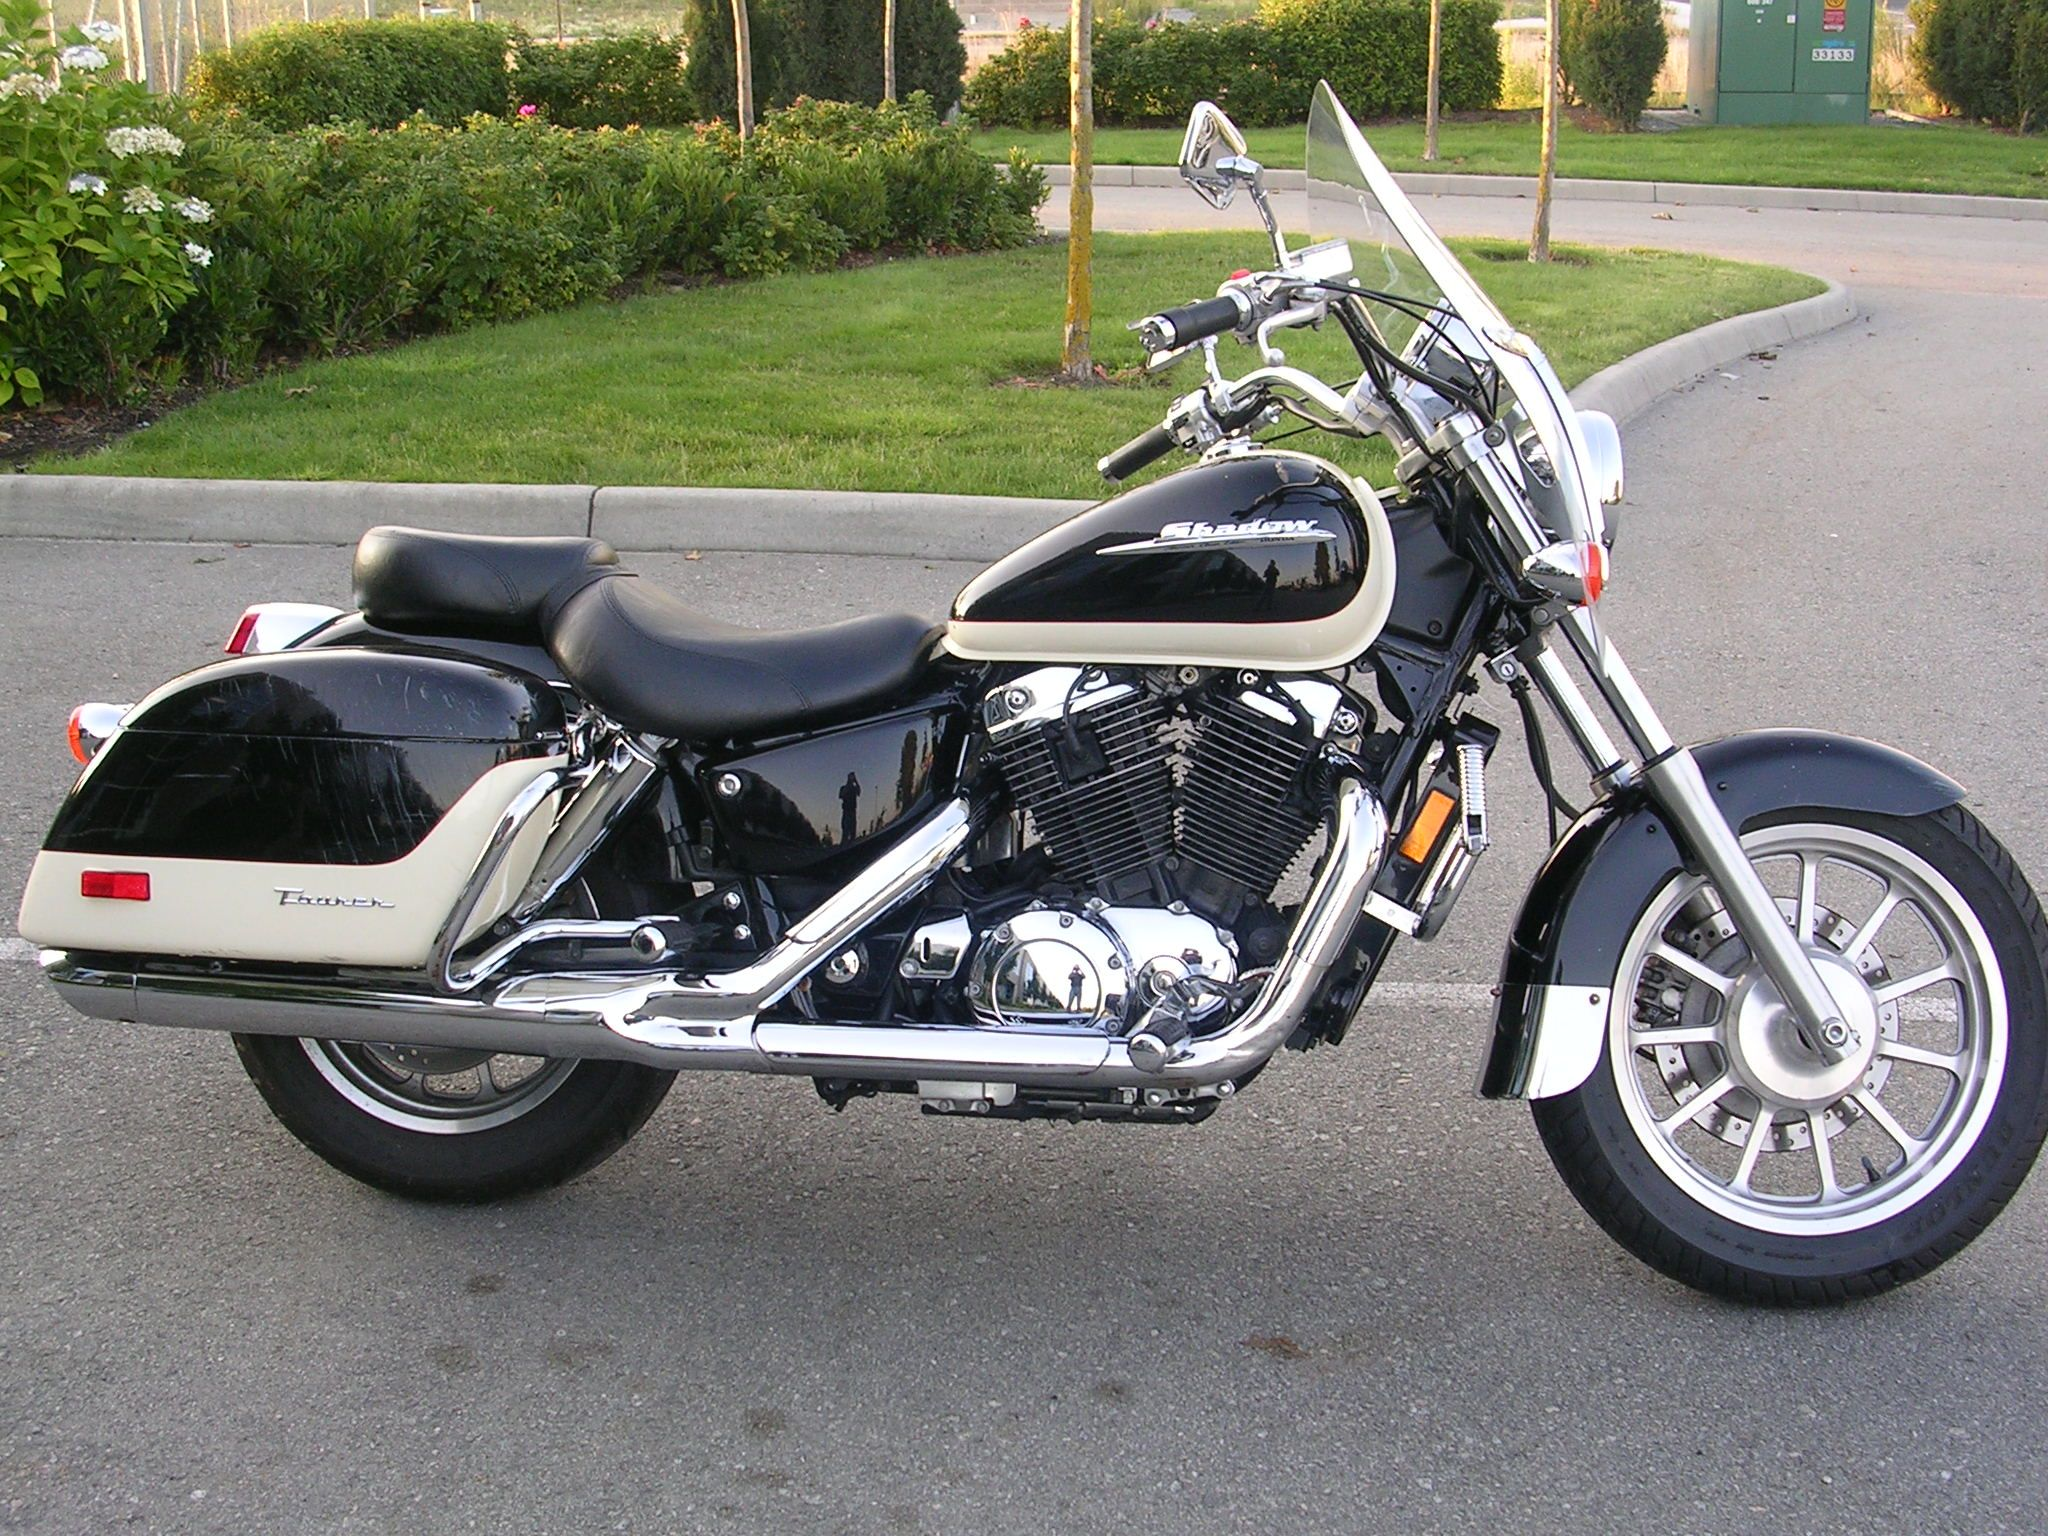 medium resolution of honda shadow 1100 touring edition the honda shadow a merican c lassic e dition tourer model vt1100t